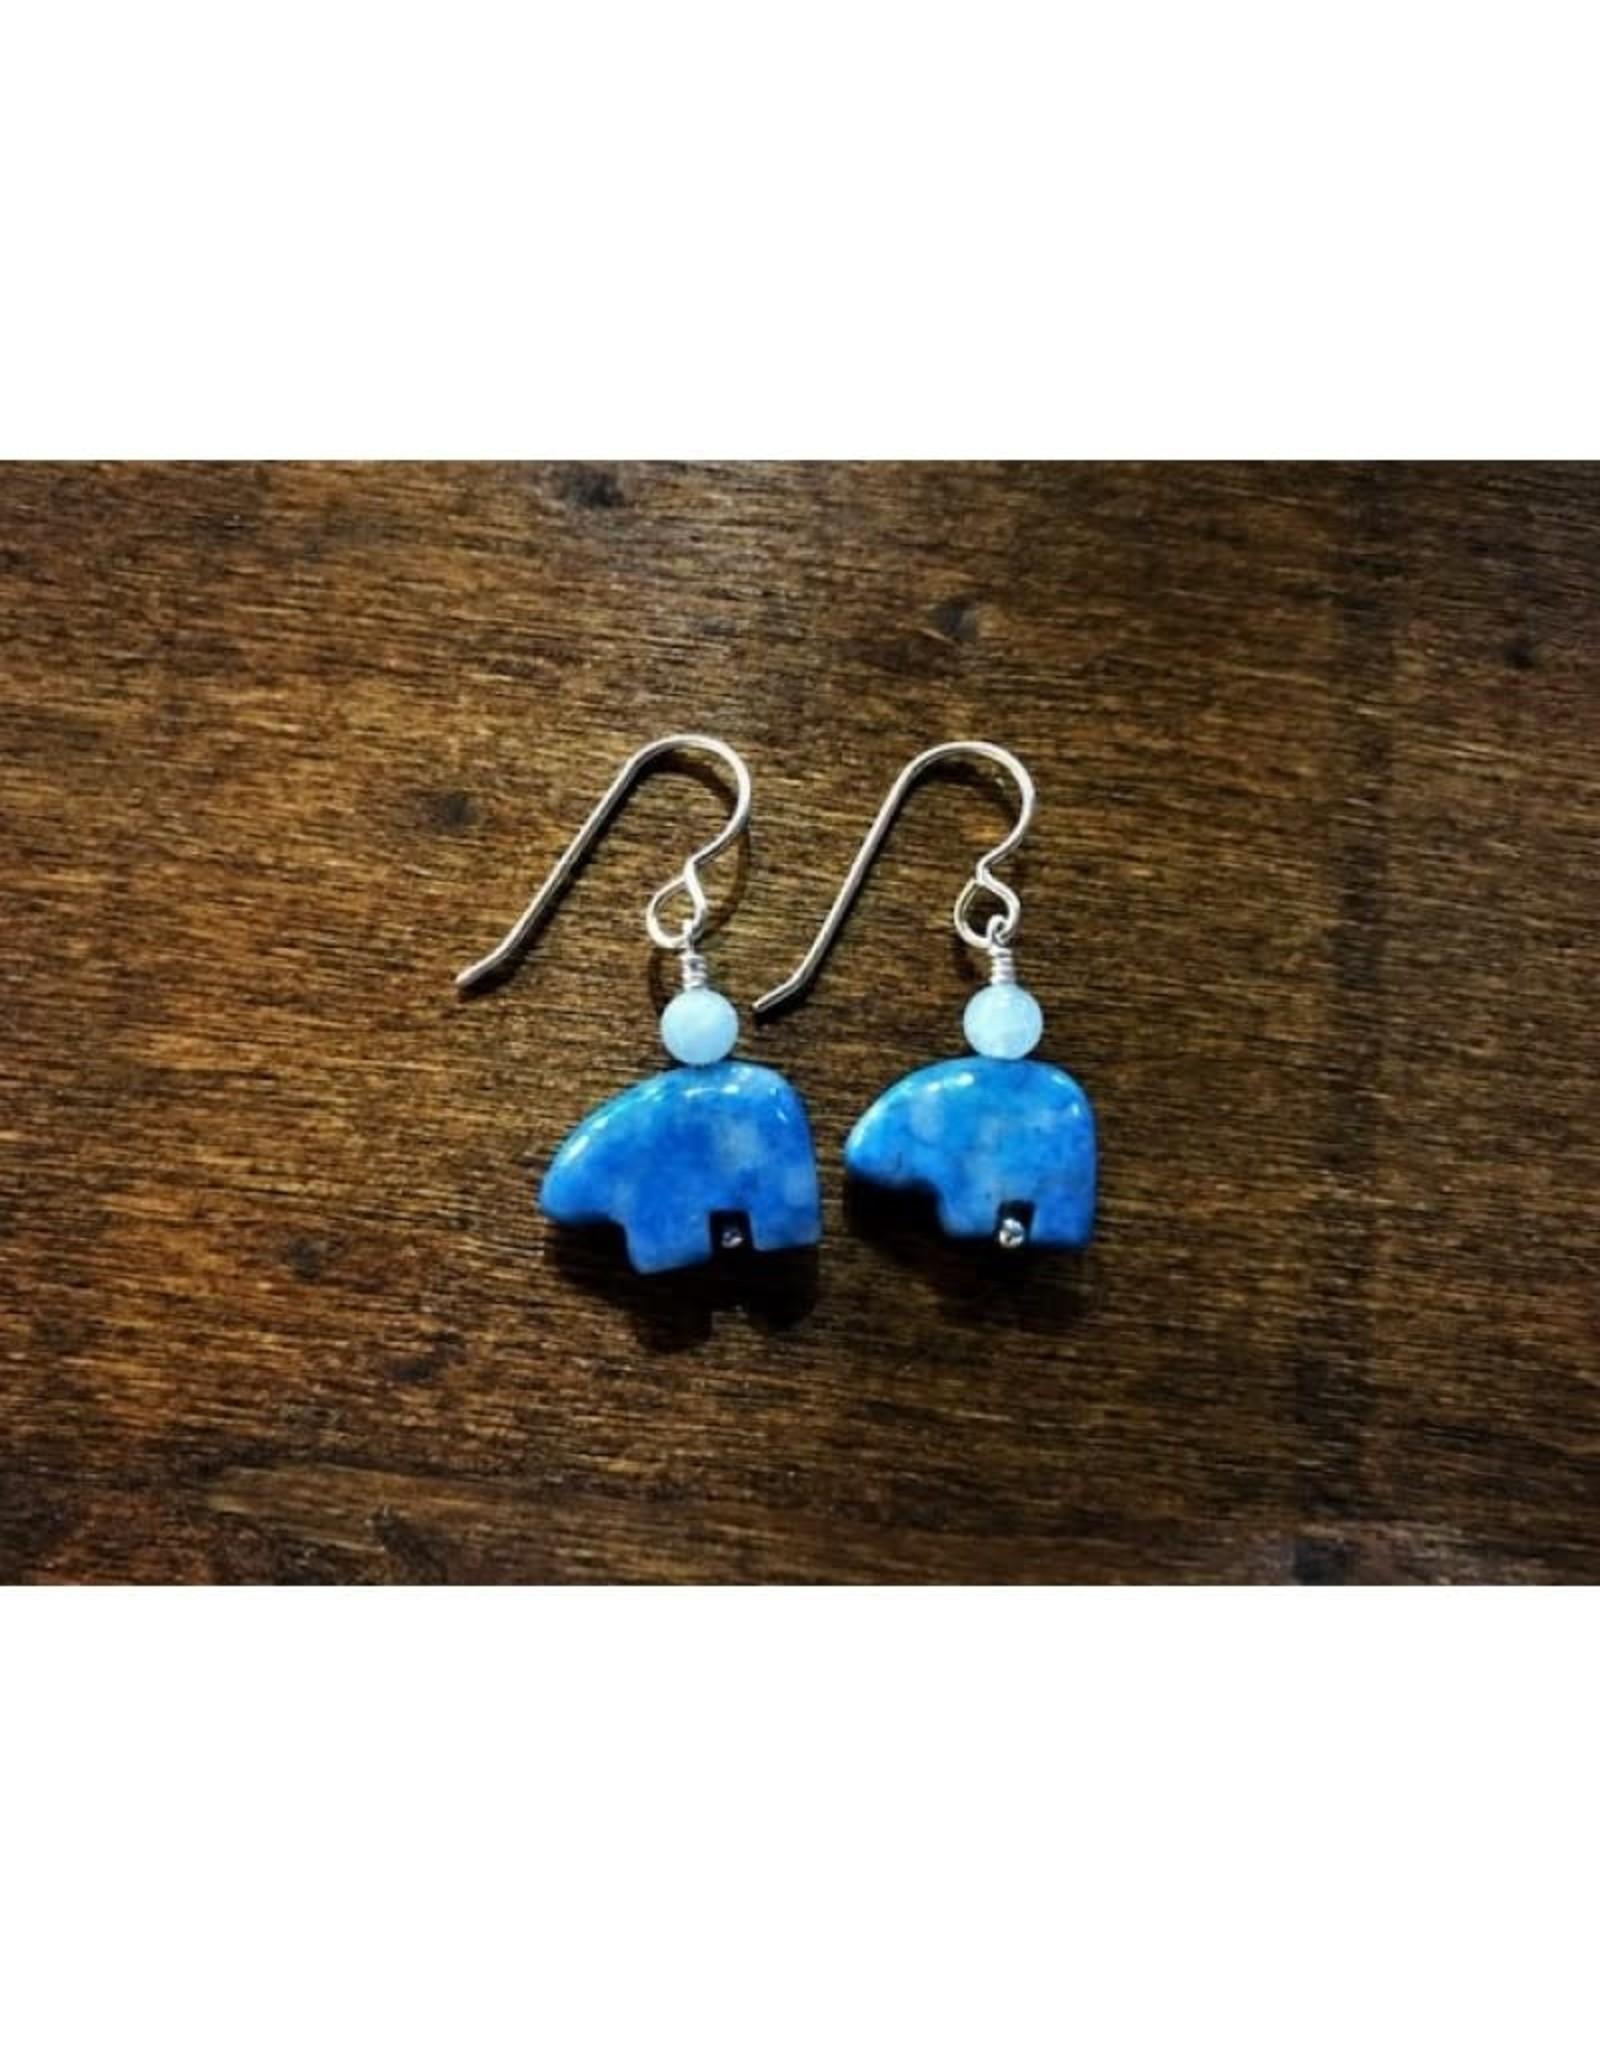 French Hook Earrings - Aquamarine & Denim Lapis Bear